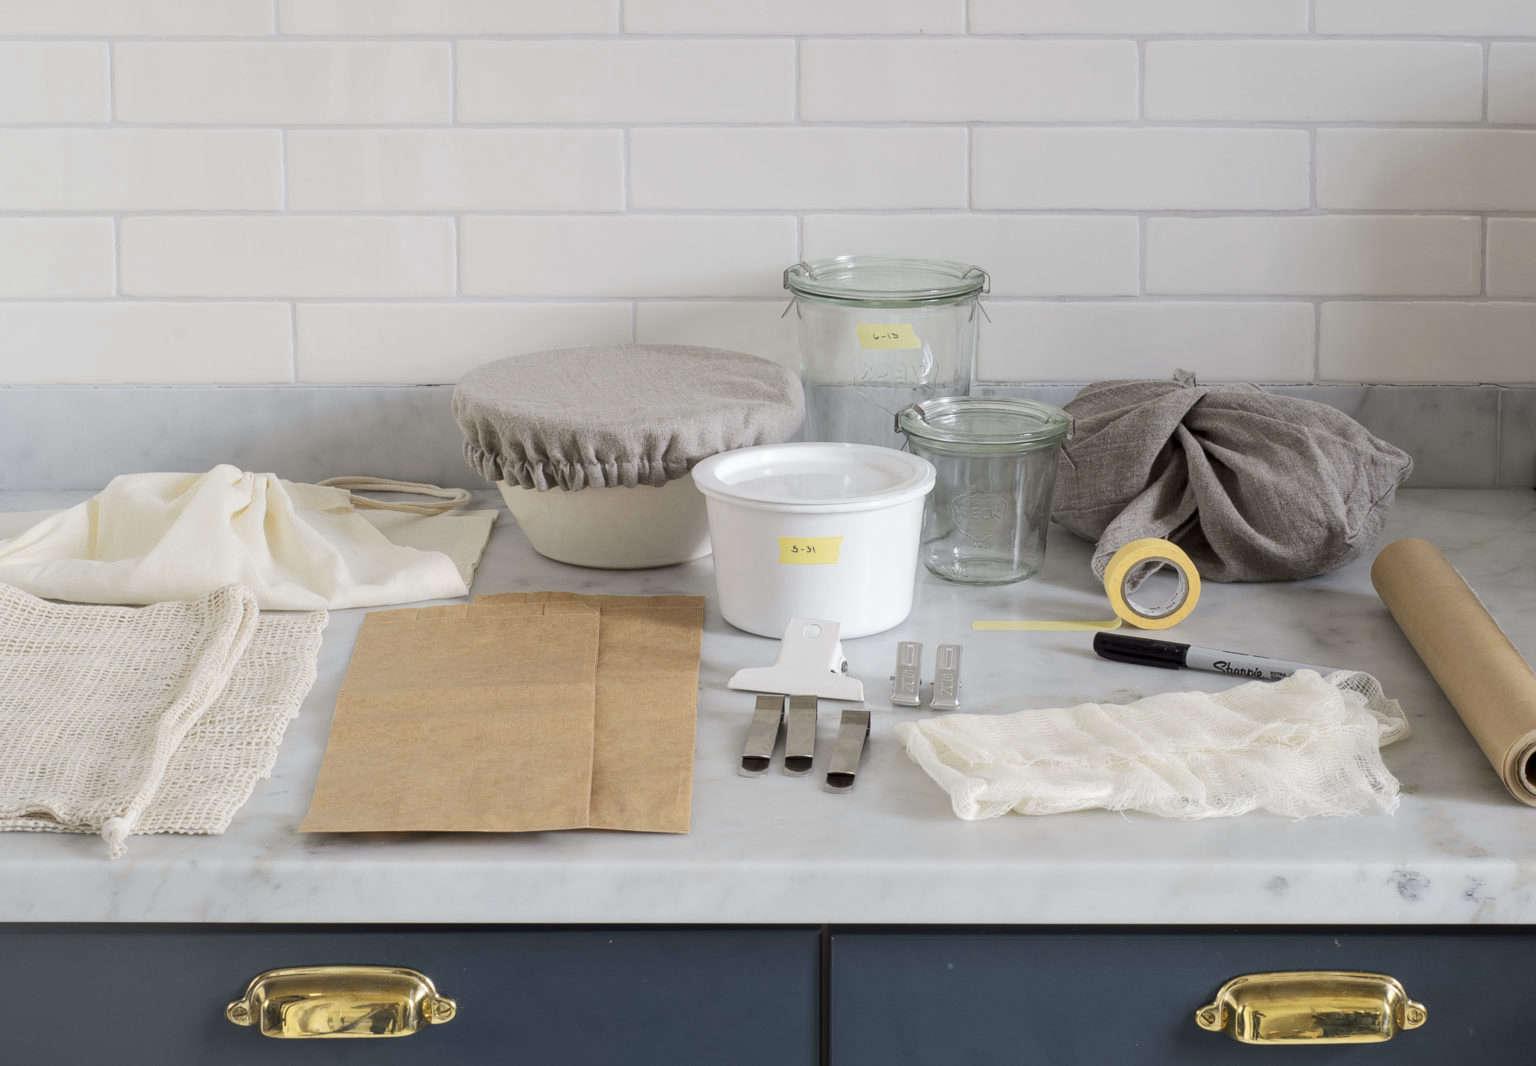 Plastic-Free Kitchen Kit Photo by Matthew Williams Styling by Alexa Hotz